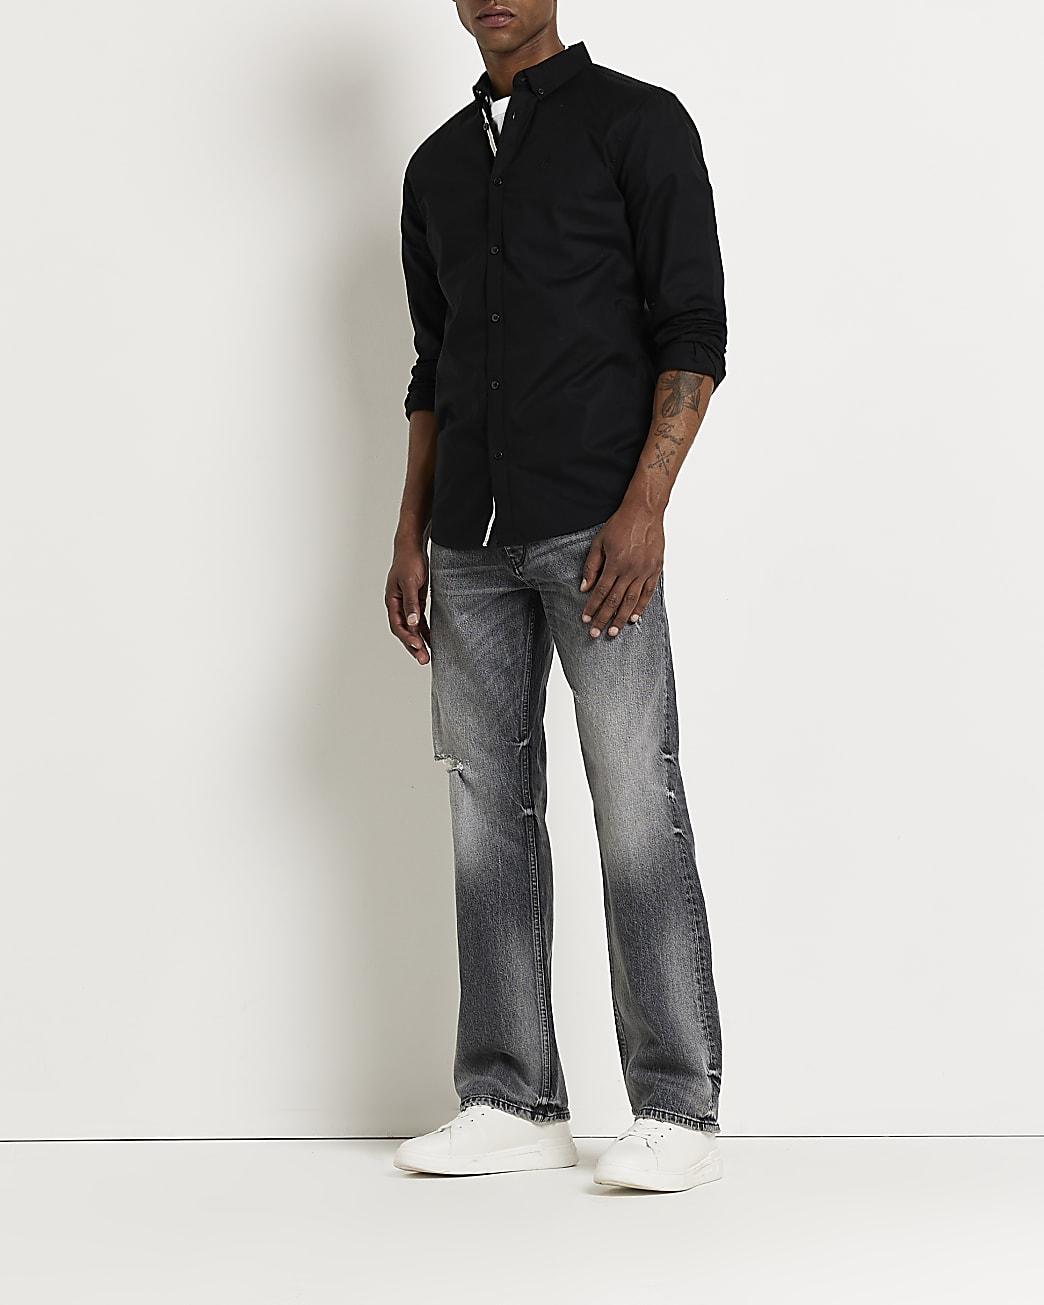 Maison Riviera black long sleeve Oxford shirt